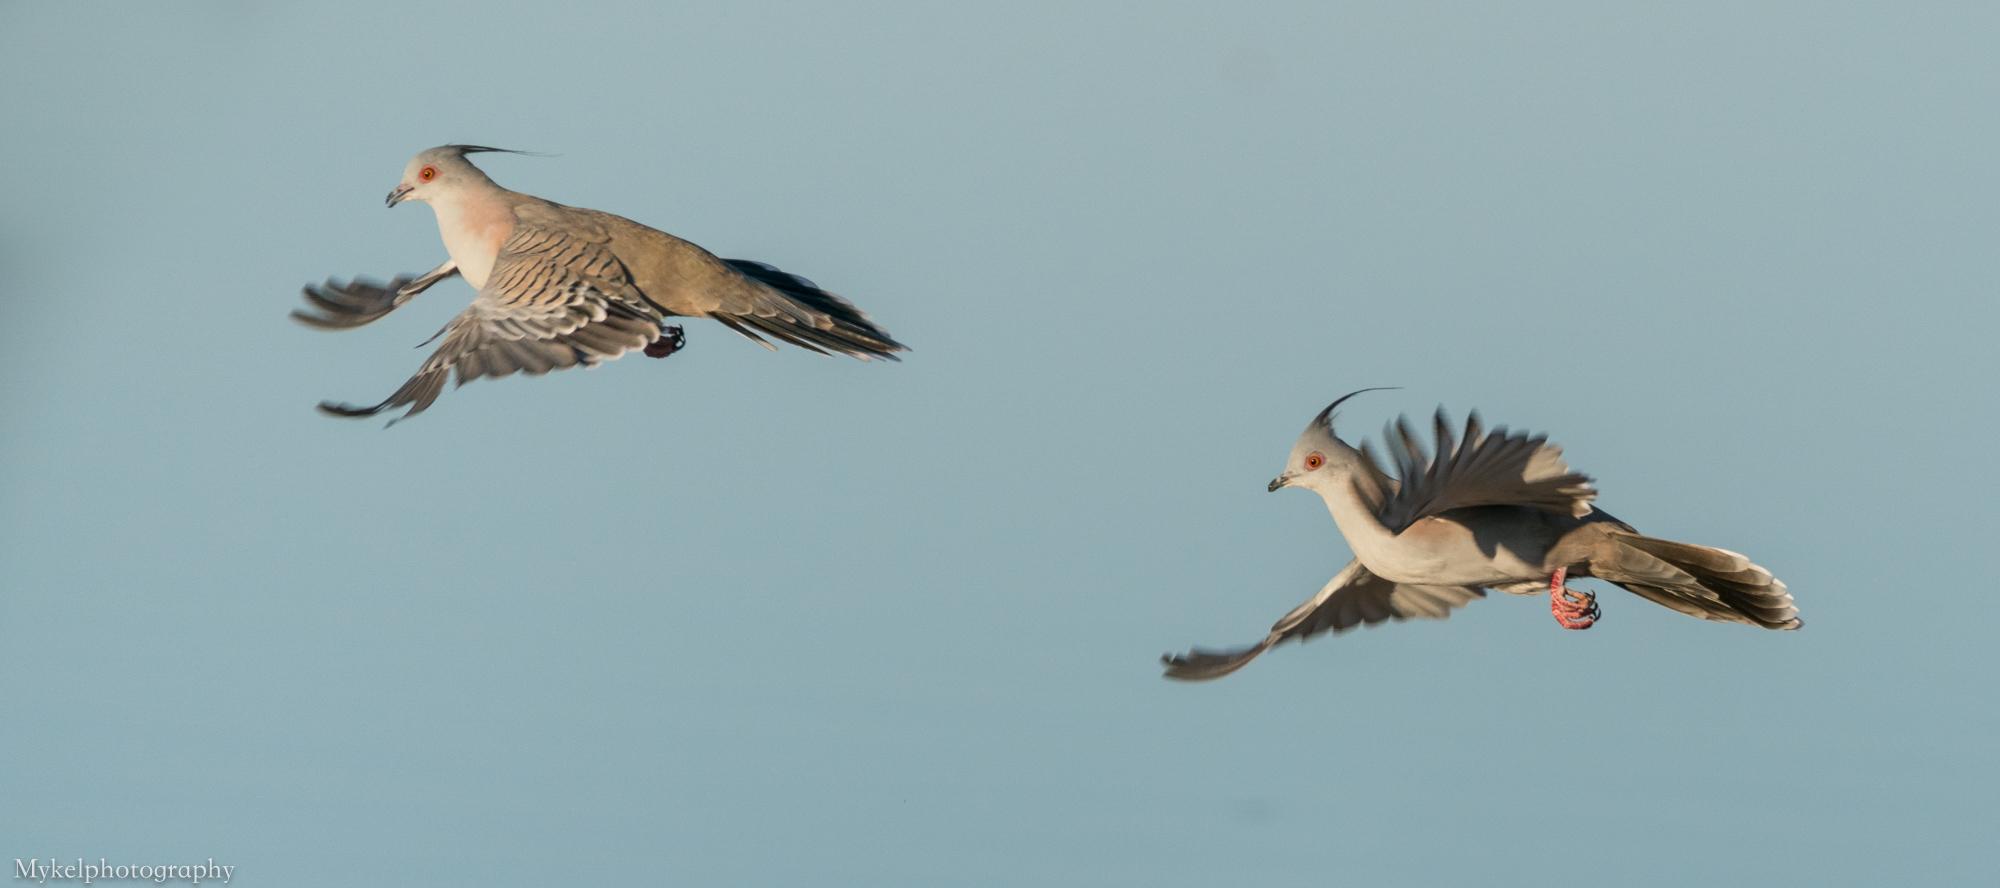 Crested Pigeon's, Ocyphaps lophotes Columbidae